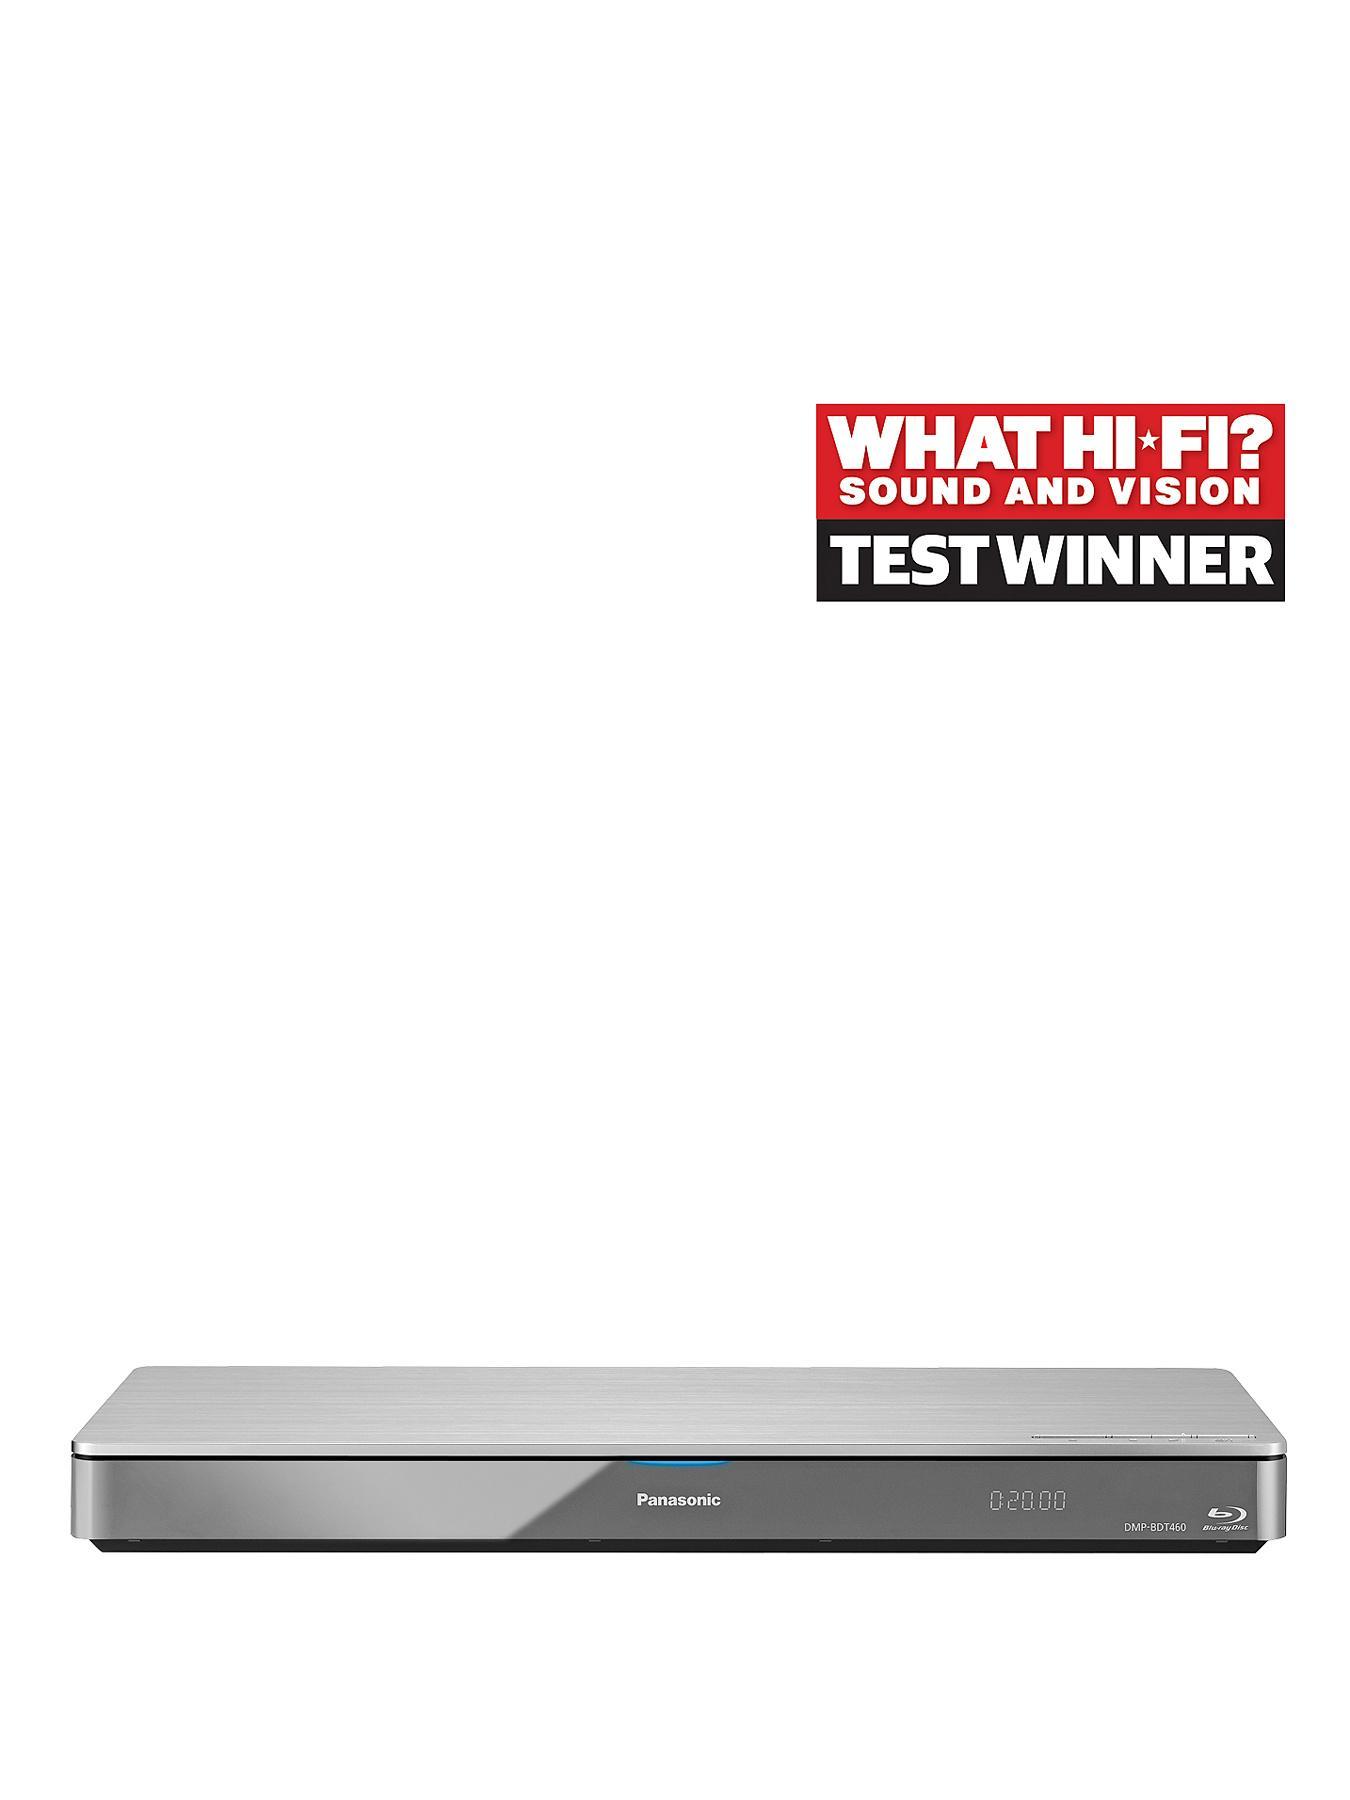 Panasonic DMP-BDT460EB 3D Smart Network Blu-ray Disc Player